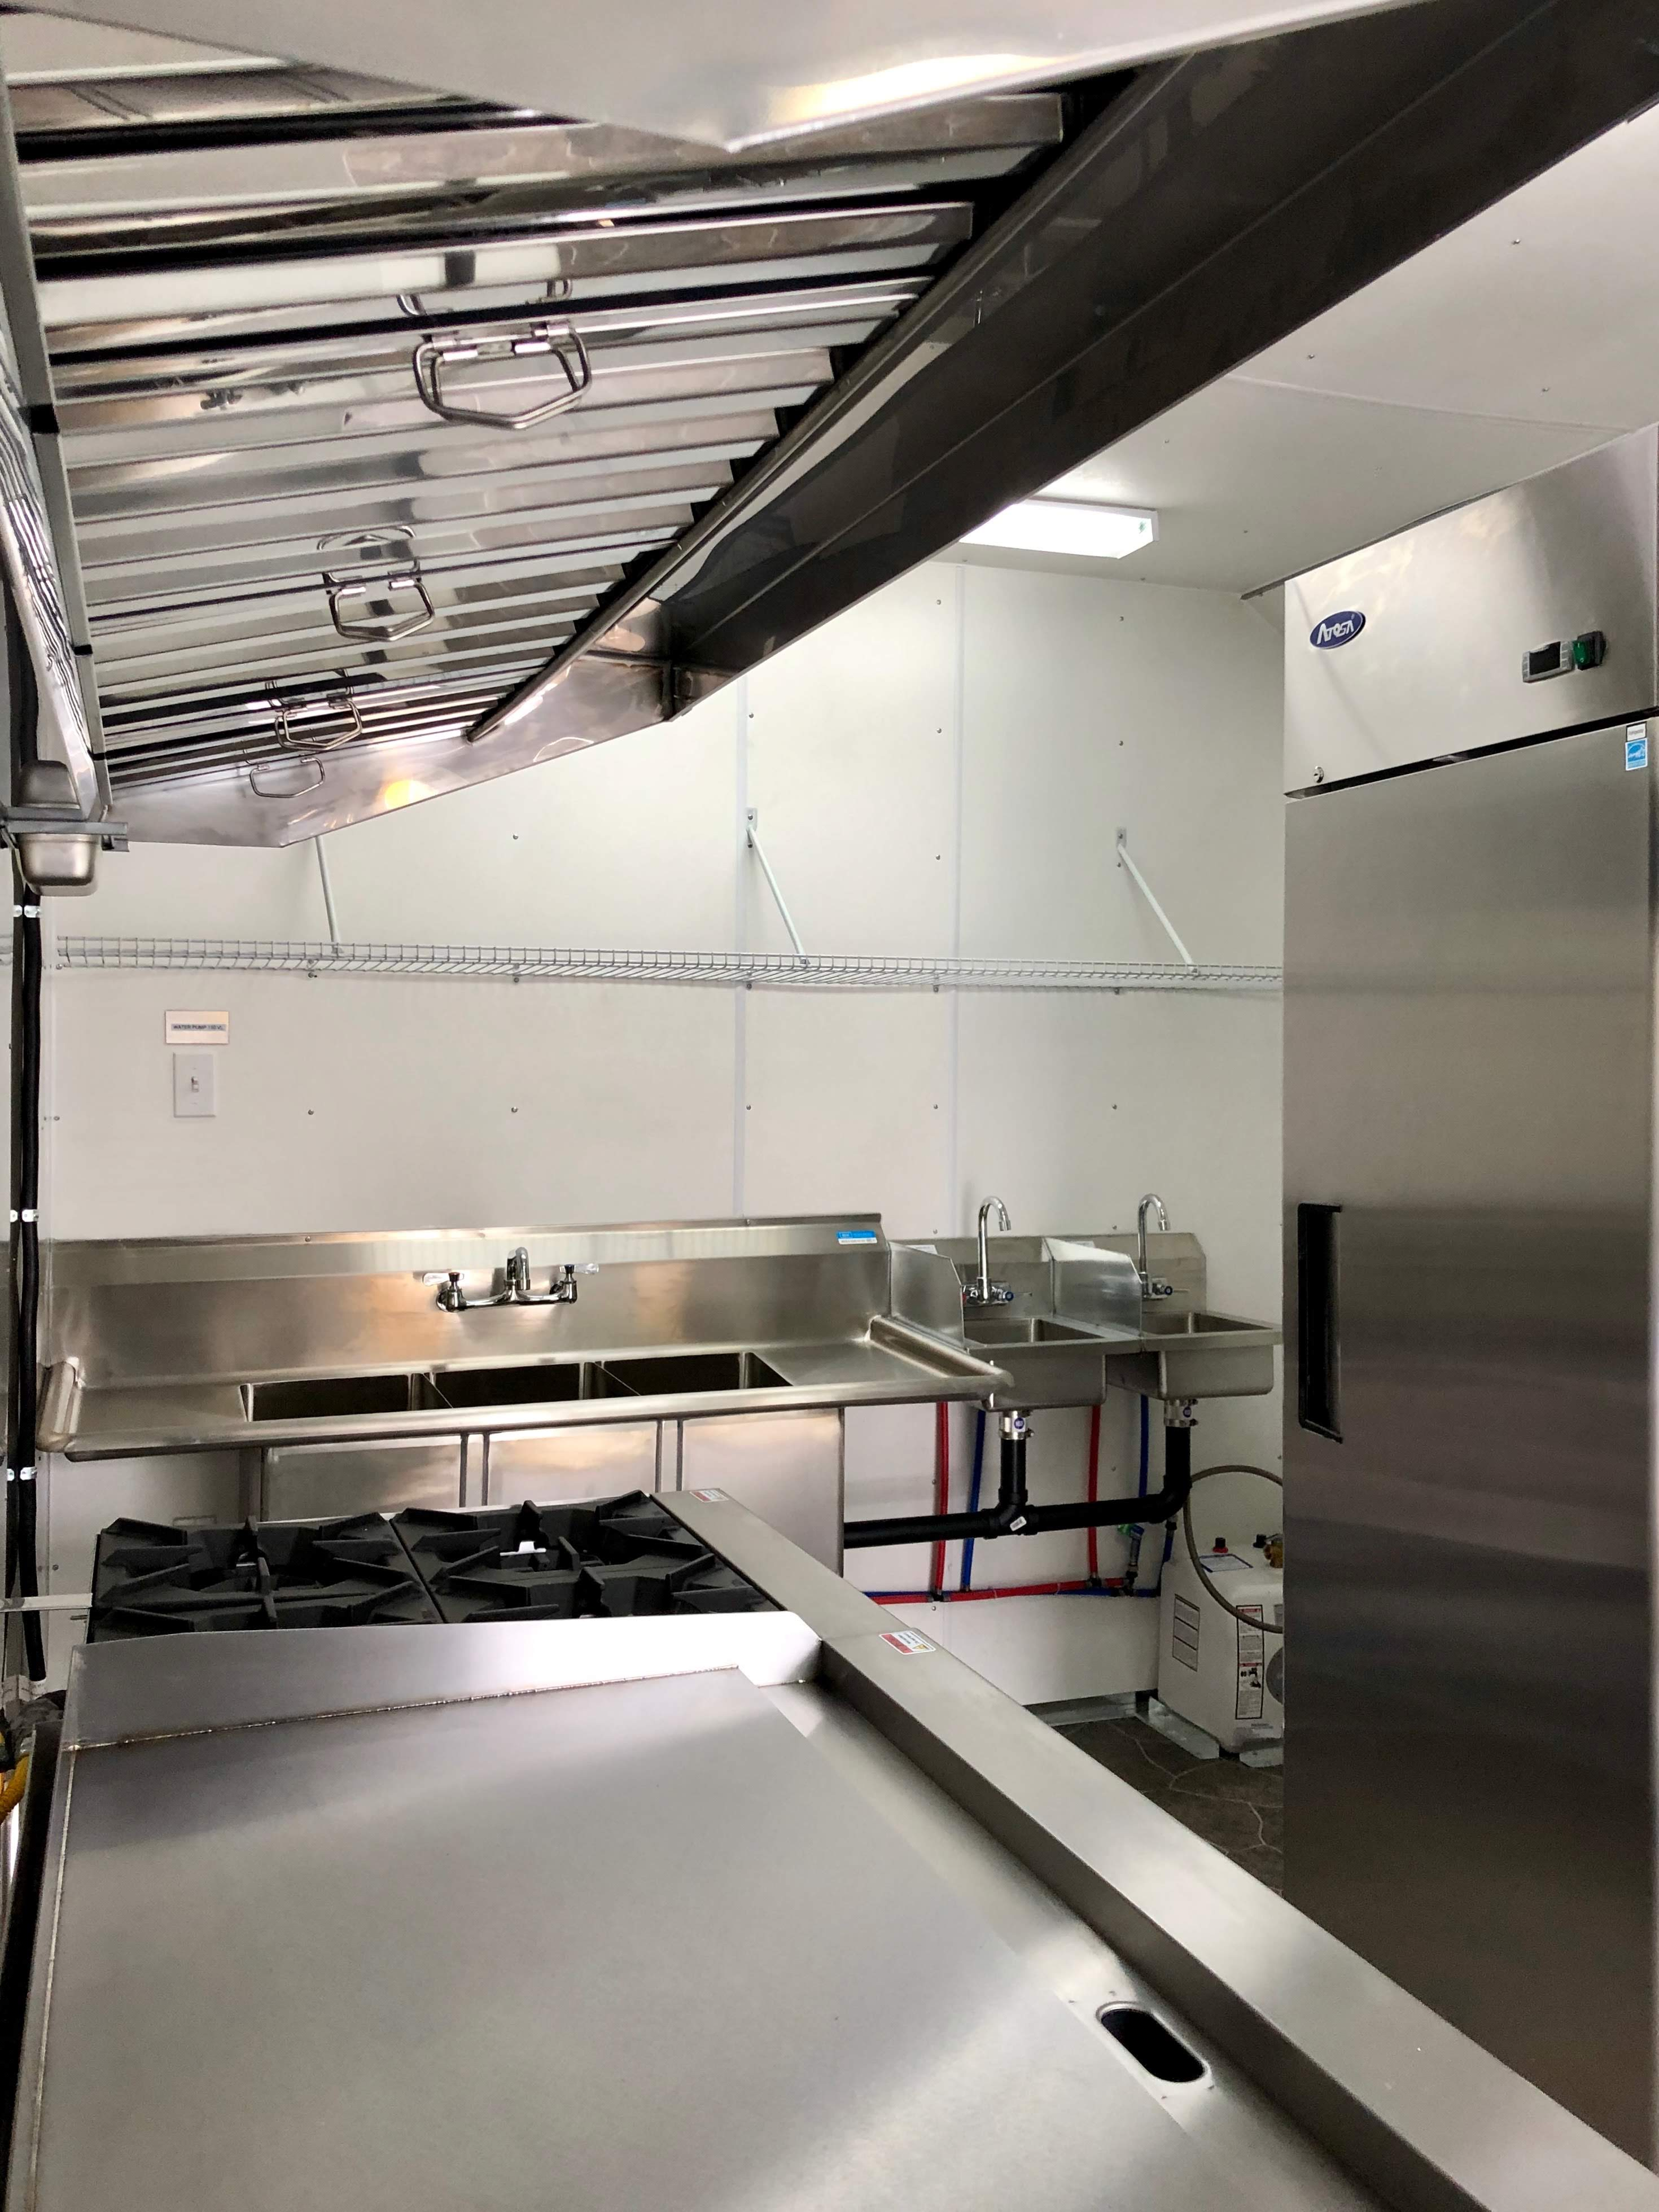 To Idaho Code Foodtruck kitchens